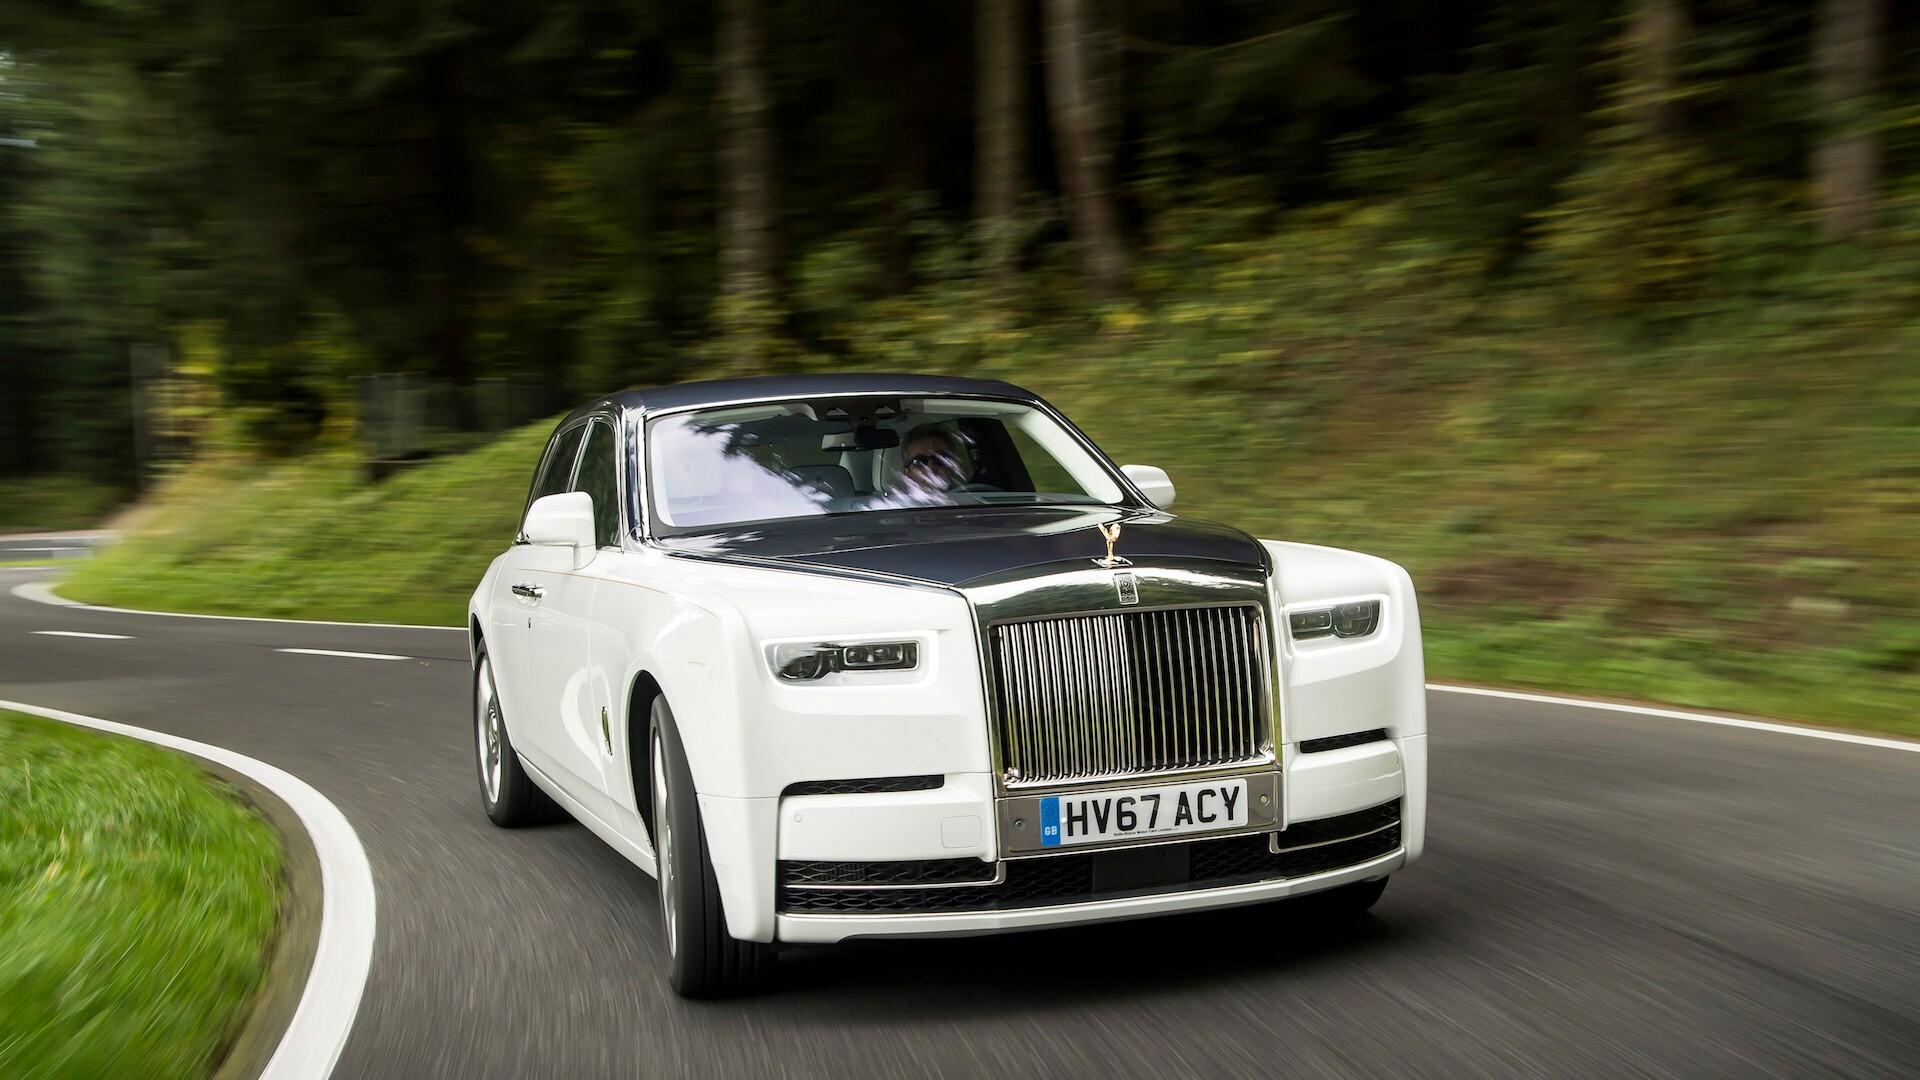 New 2018 Rolls Royce Phantom Car Hd Wallpapers